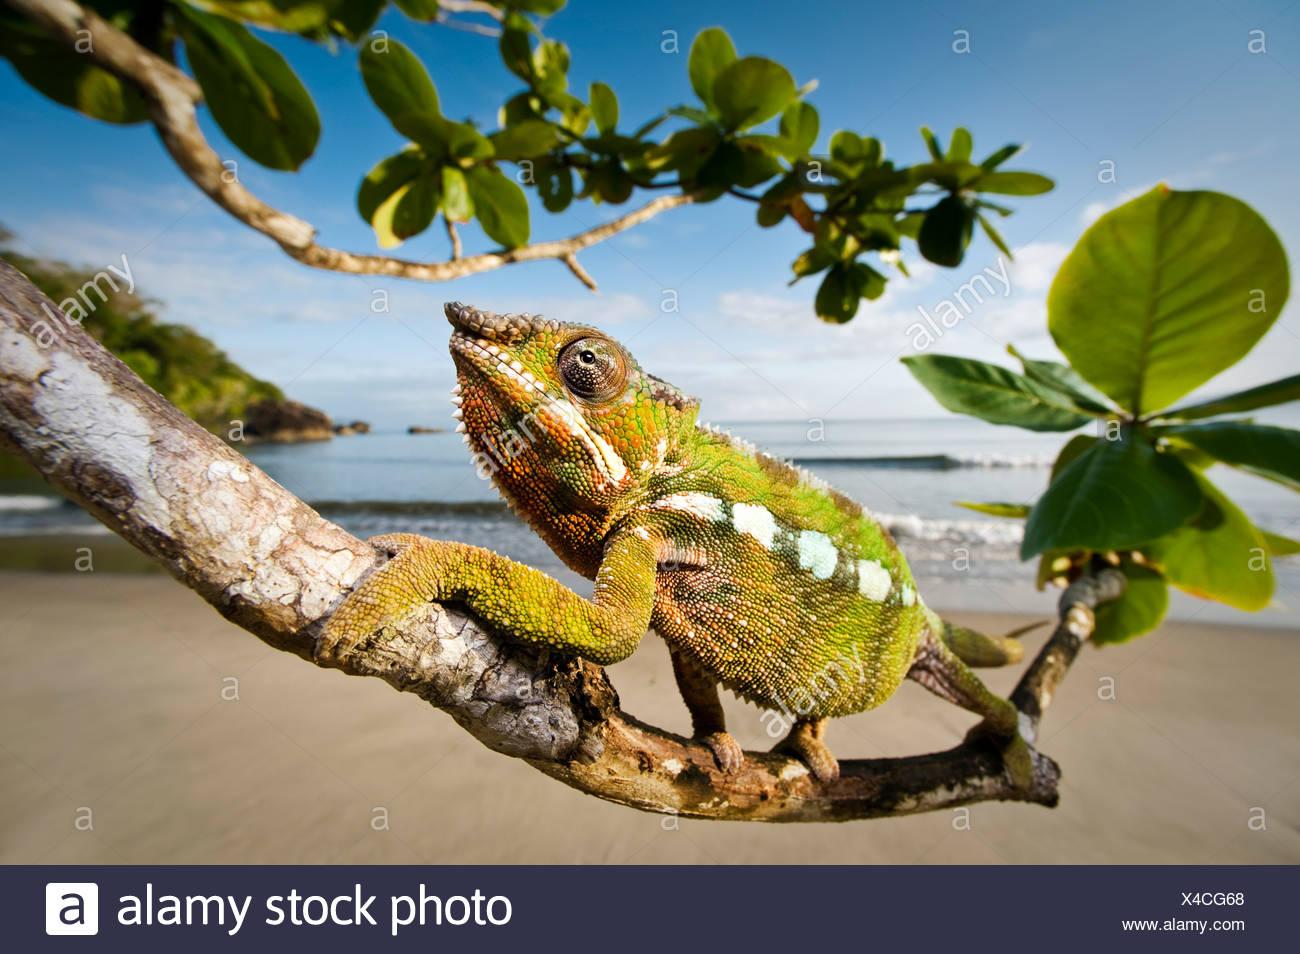 Male Panther Chameleon stalking prey in beach side vegetation, Bay of Antongil, Masoala Peninsula National Park, Madagascar. - Stock Image